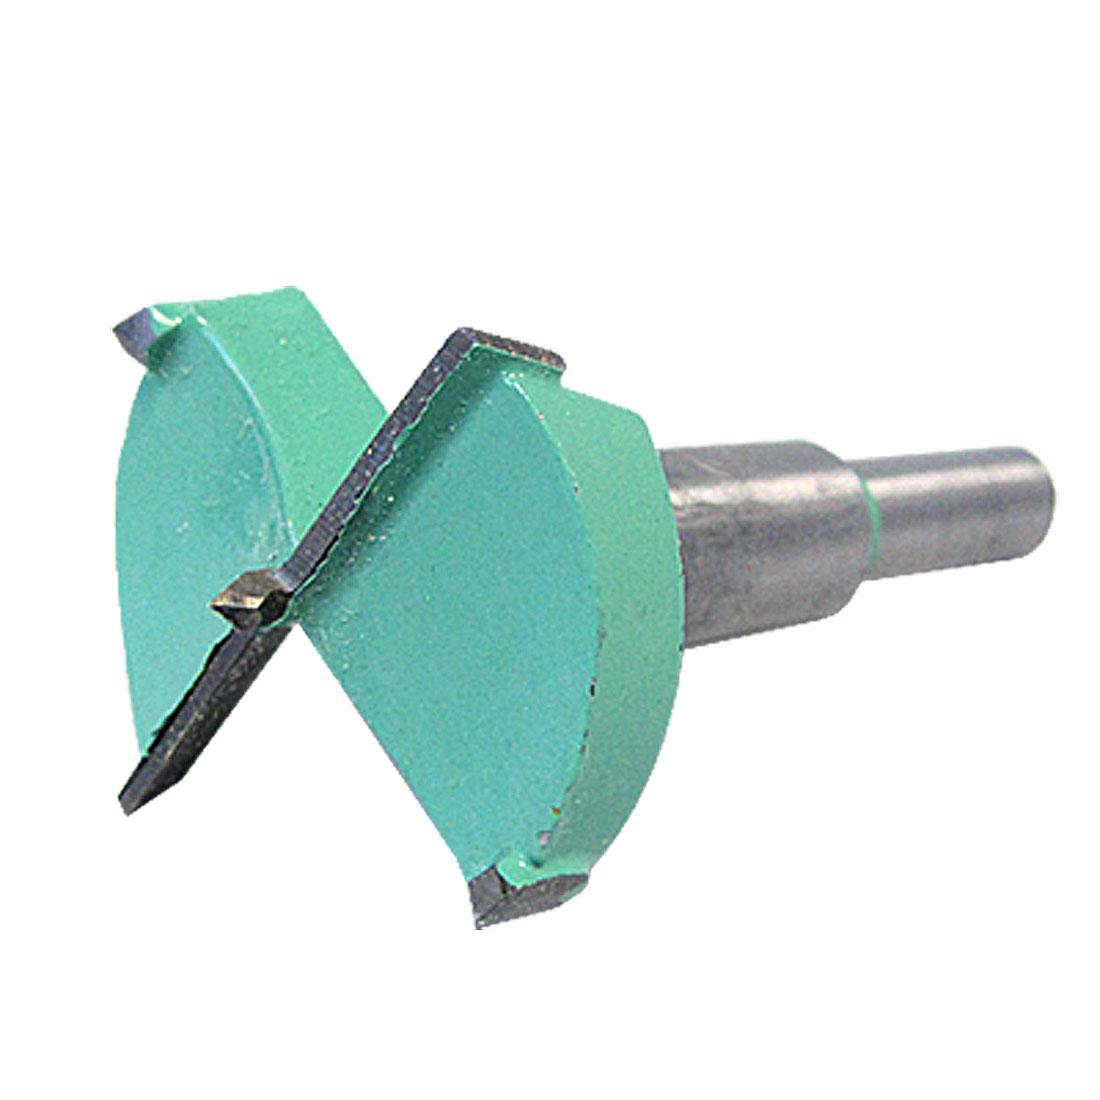 Boring Drill Tool Wood Forstner Bit Set 40mm